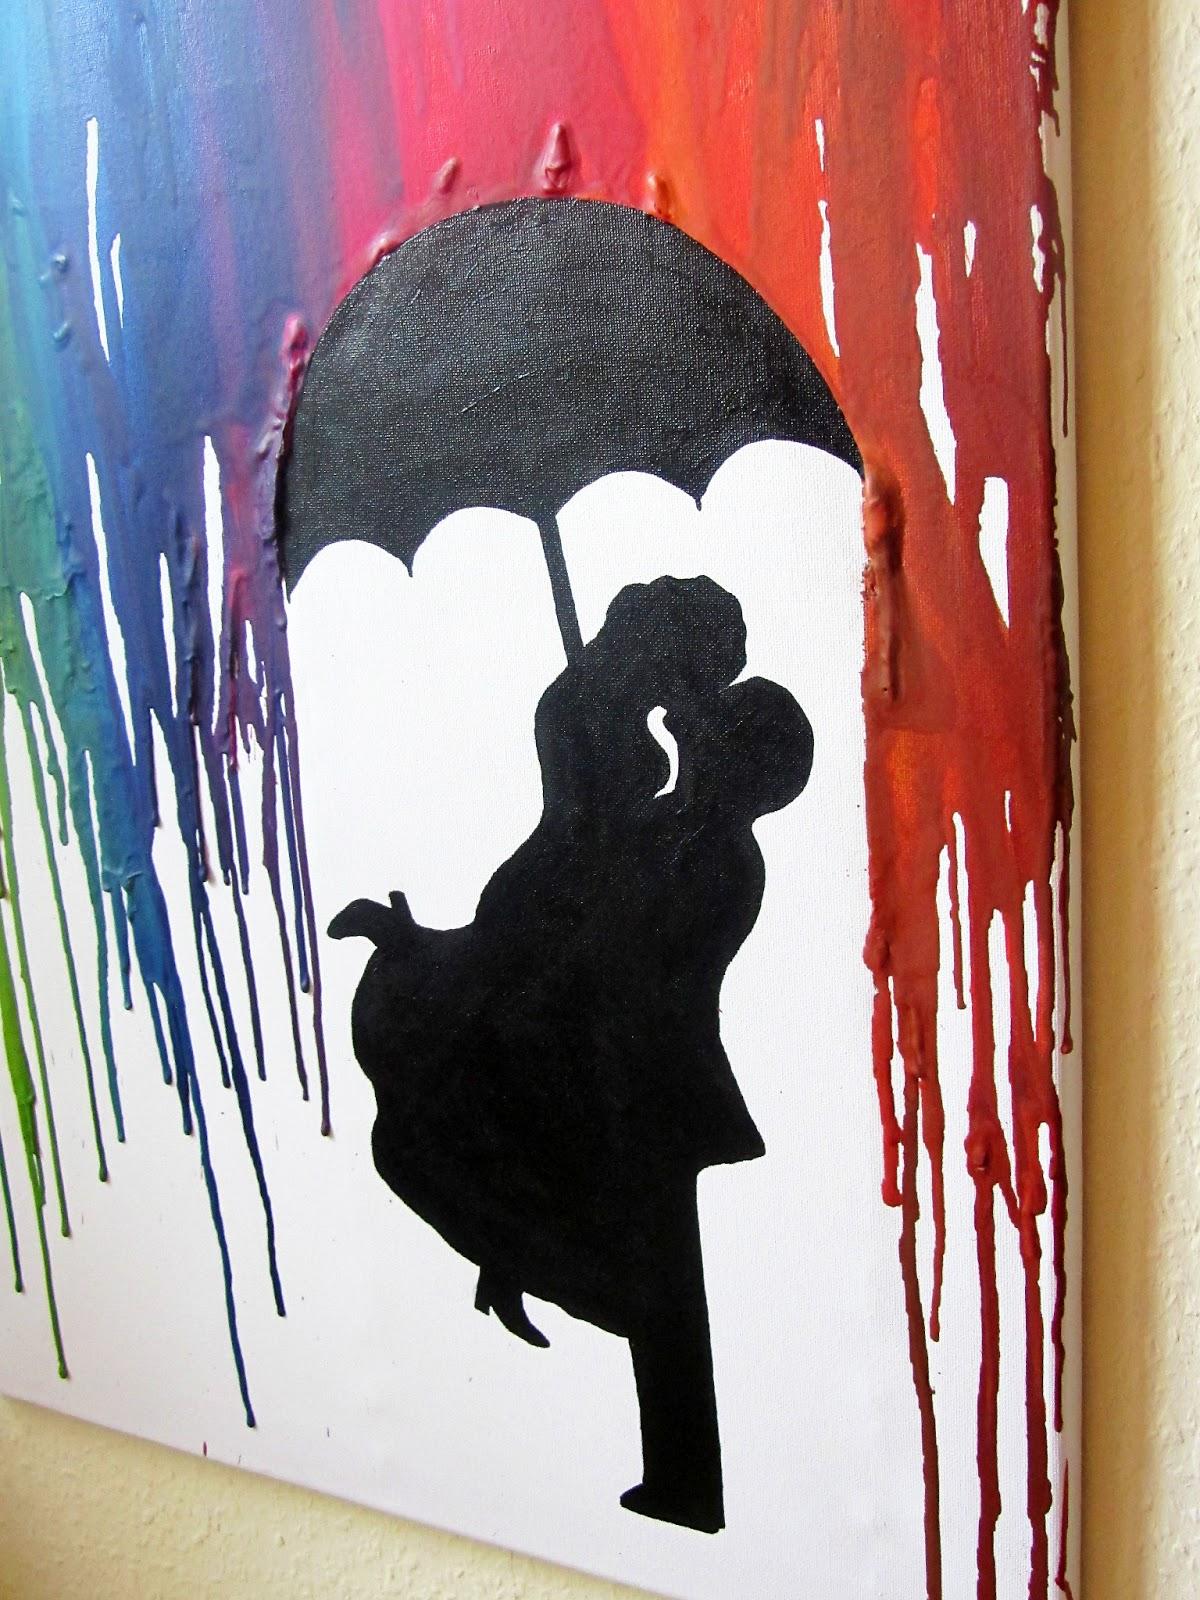 Kreativ Oder Primitiv Crayon Art Parchen Im Regen